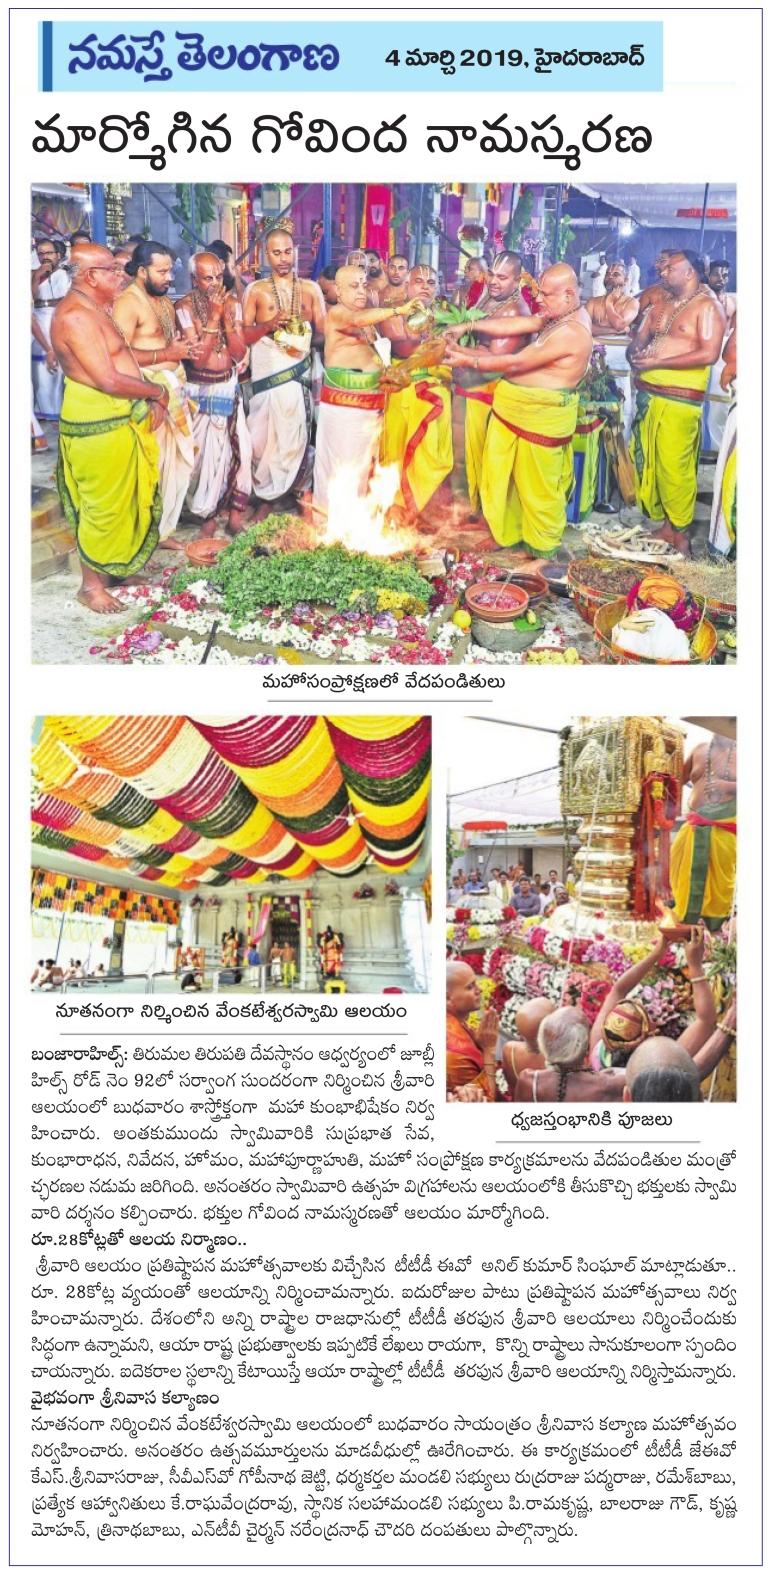 SVS Temple Film Nagar Hyd Namaste Telangana Hyderabad contd 14-03-2019